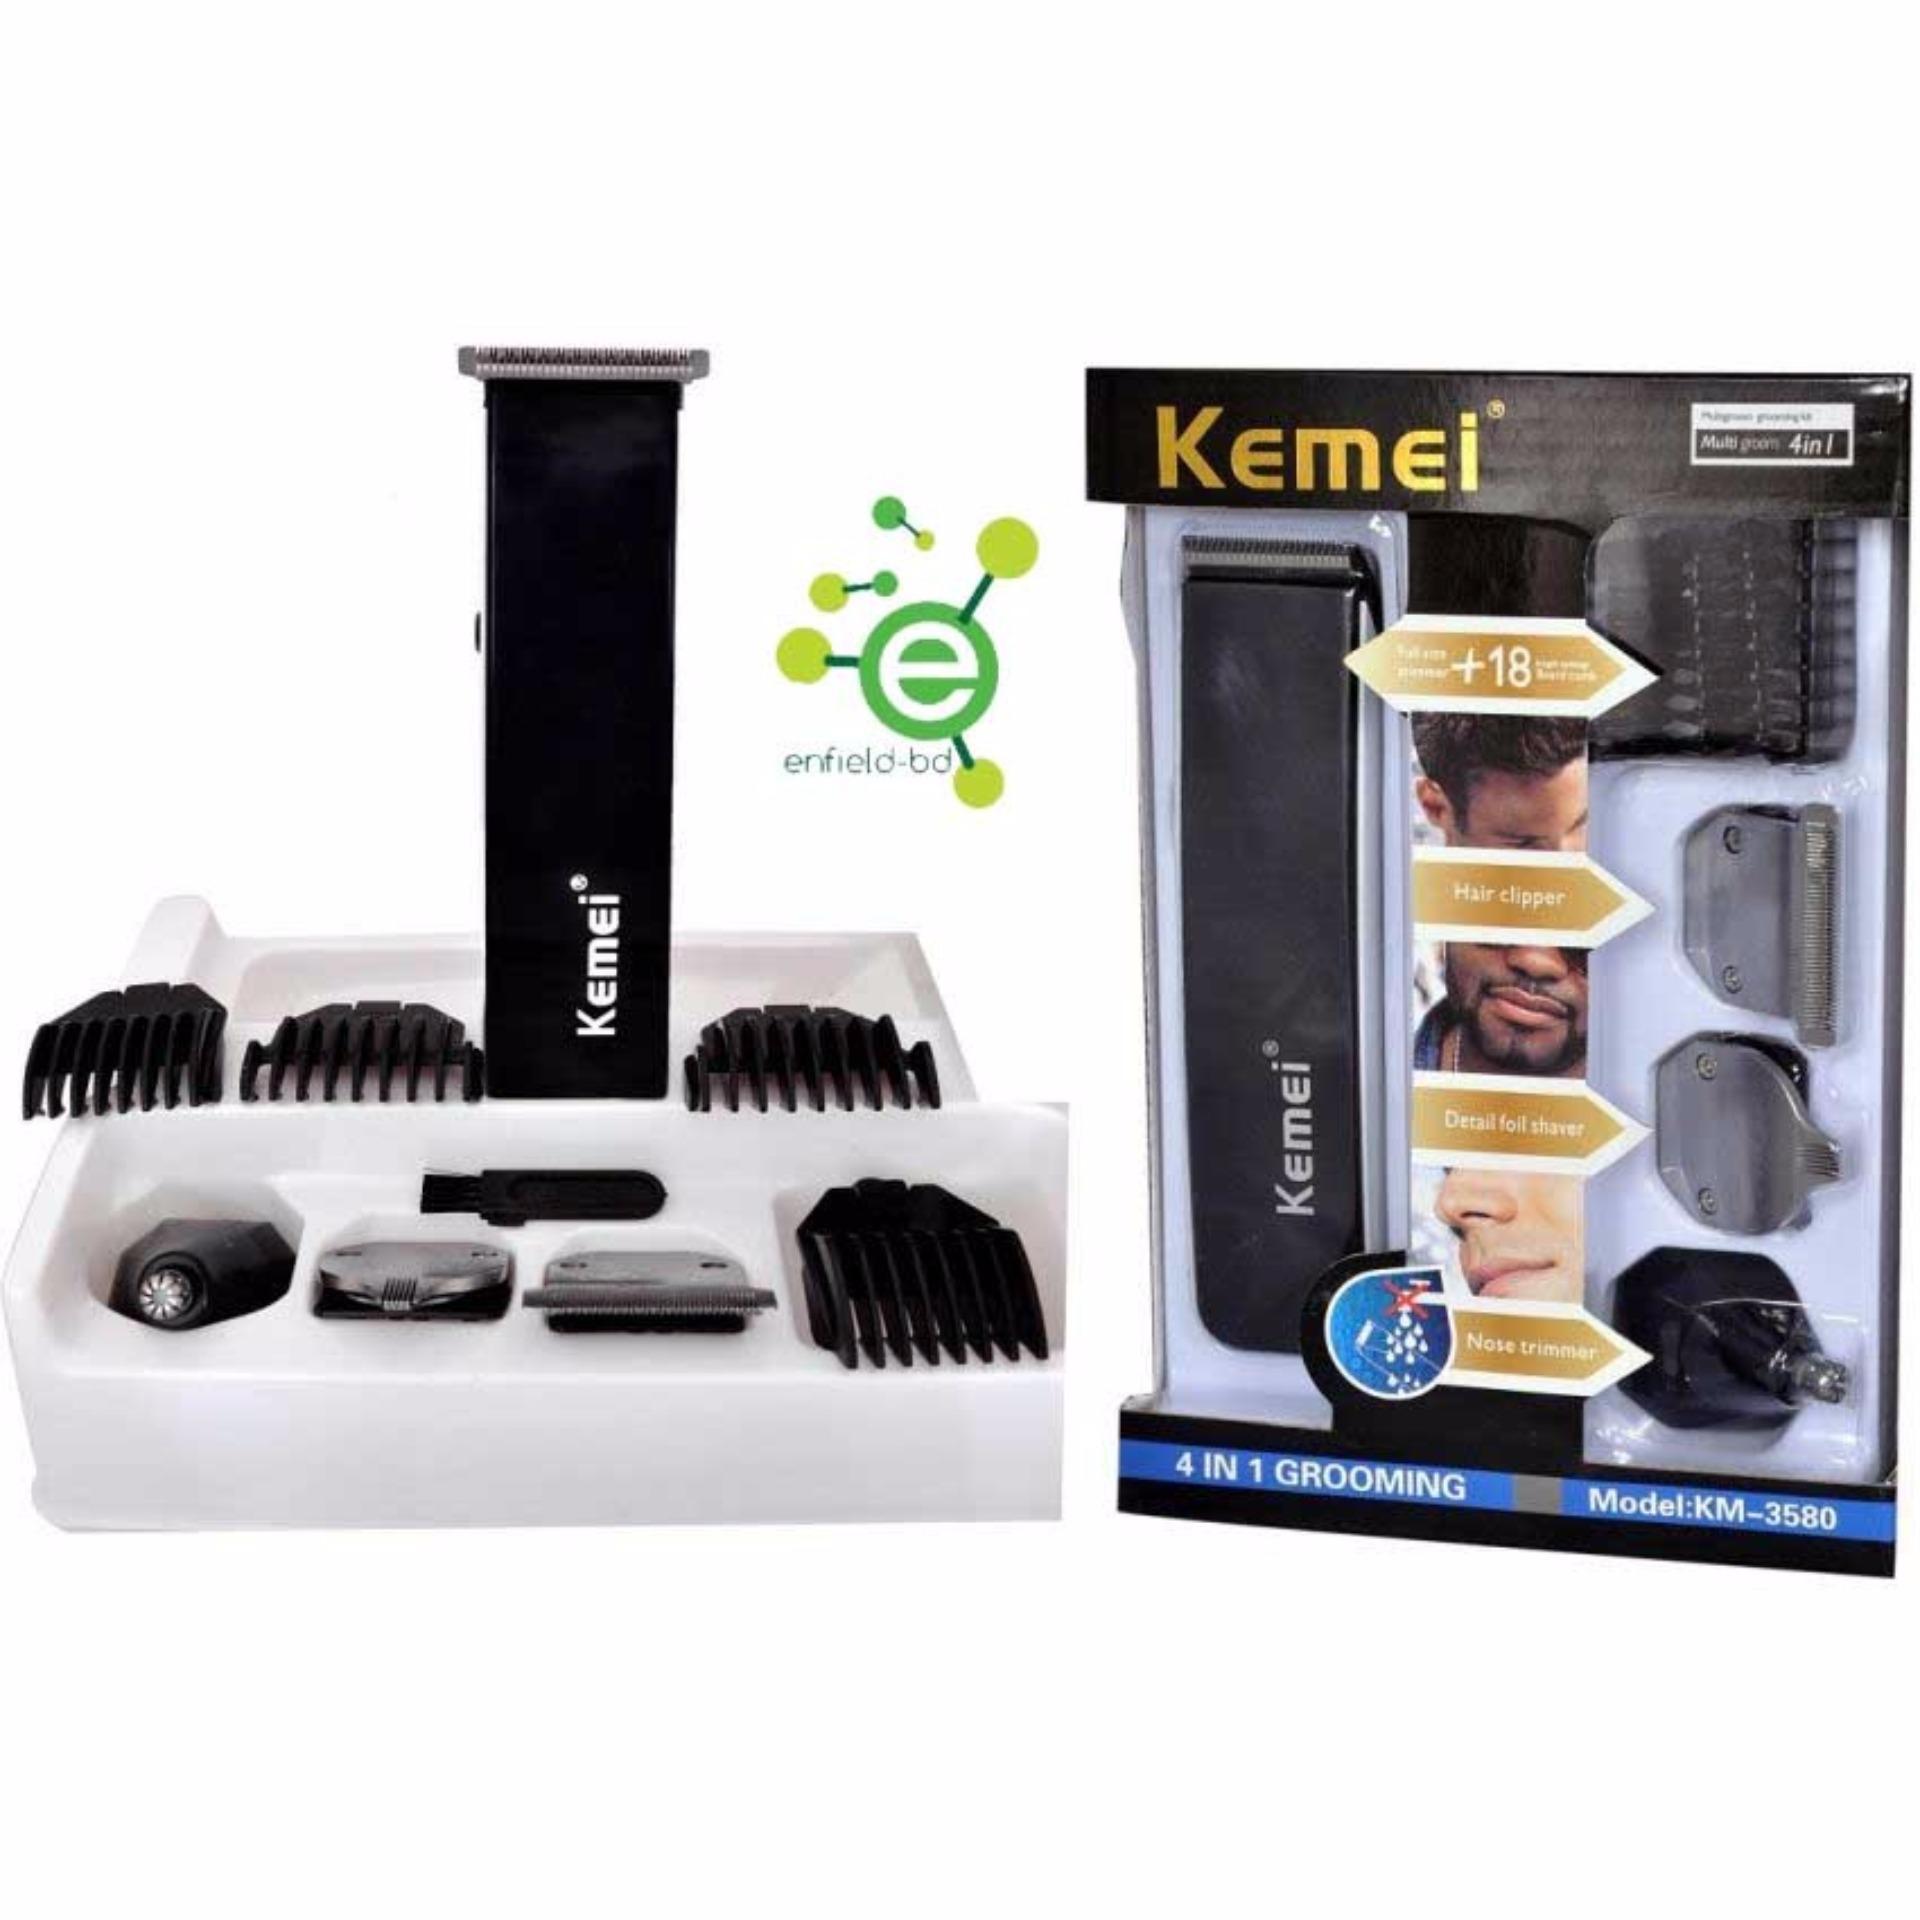 Mesin Cukur Rambut KEMEI KM-3590 Multigroom 5 in 1 Rechargeable Hair Clipper d40632db05